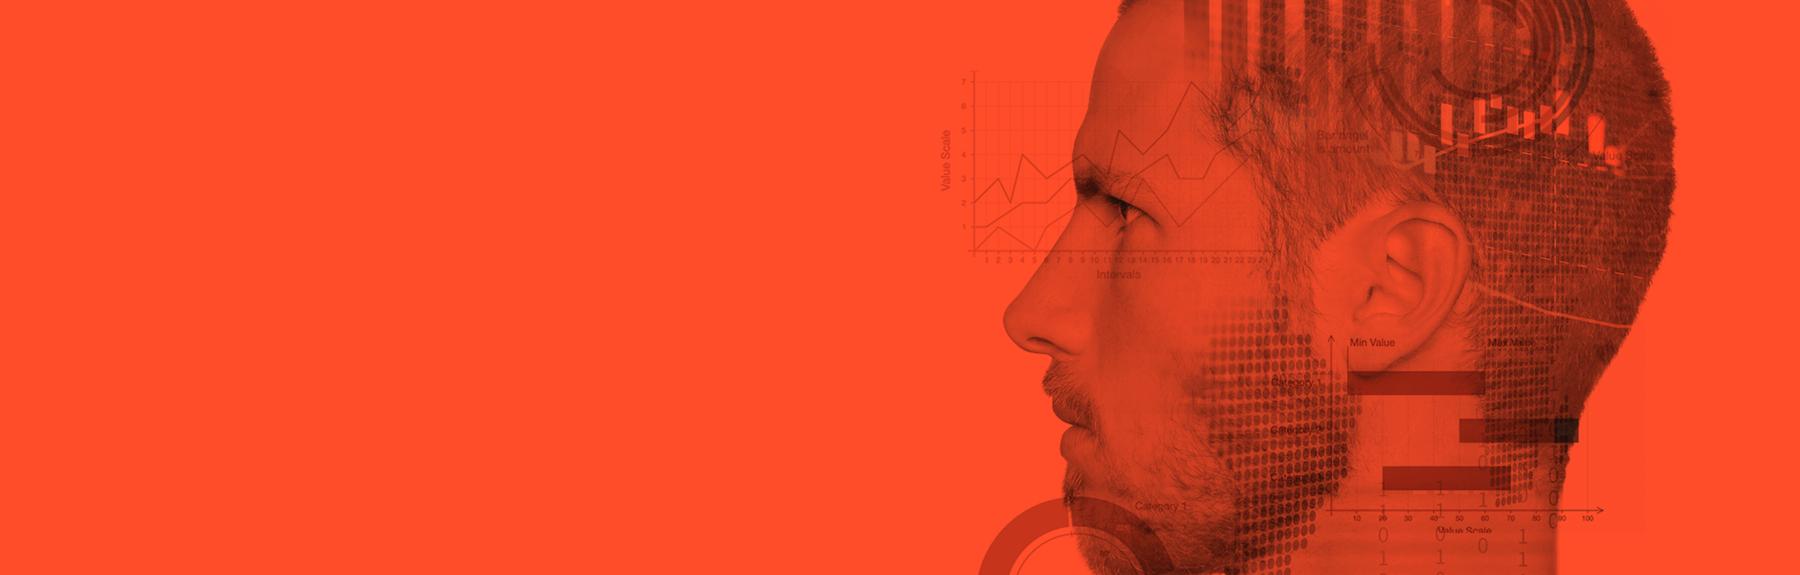 UX-designer-user-personas-guide-header-blog